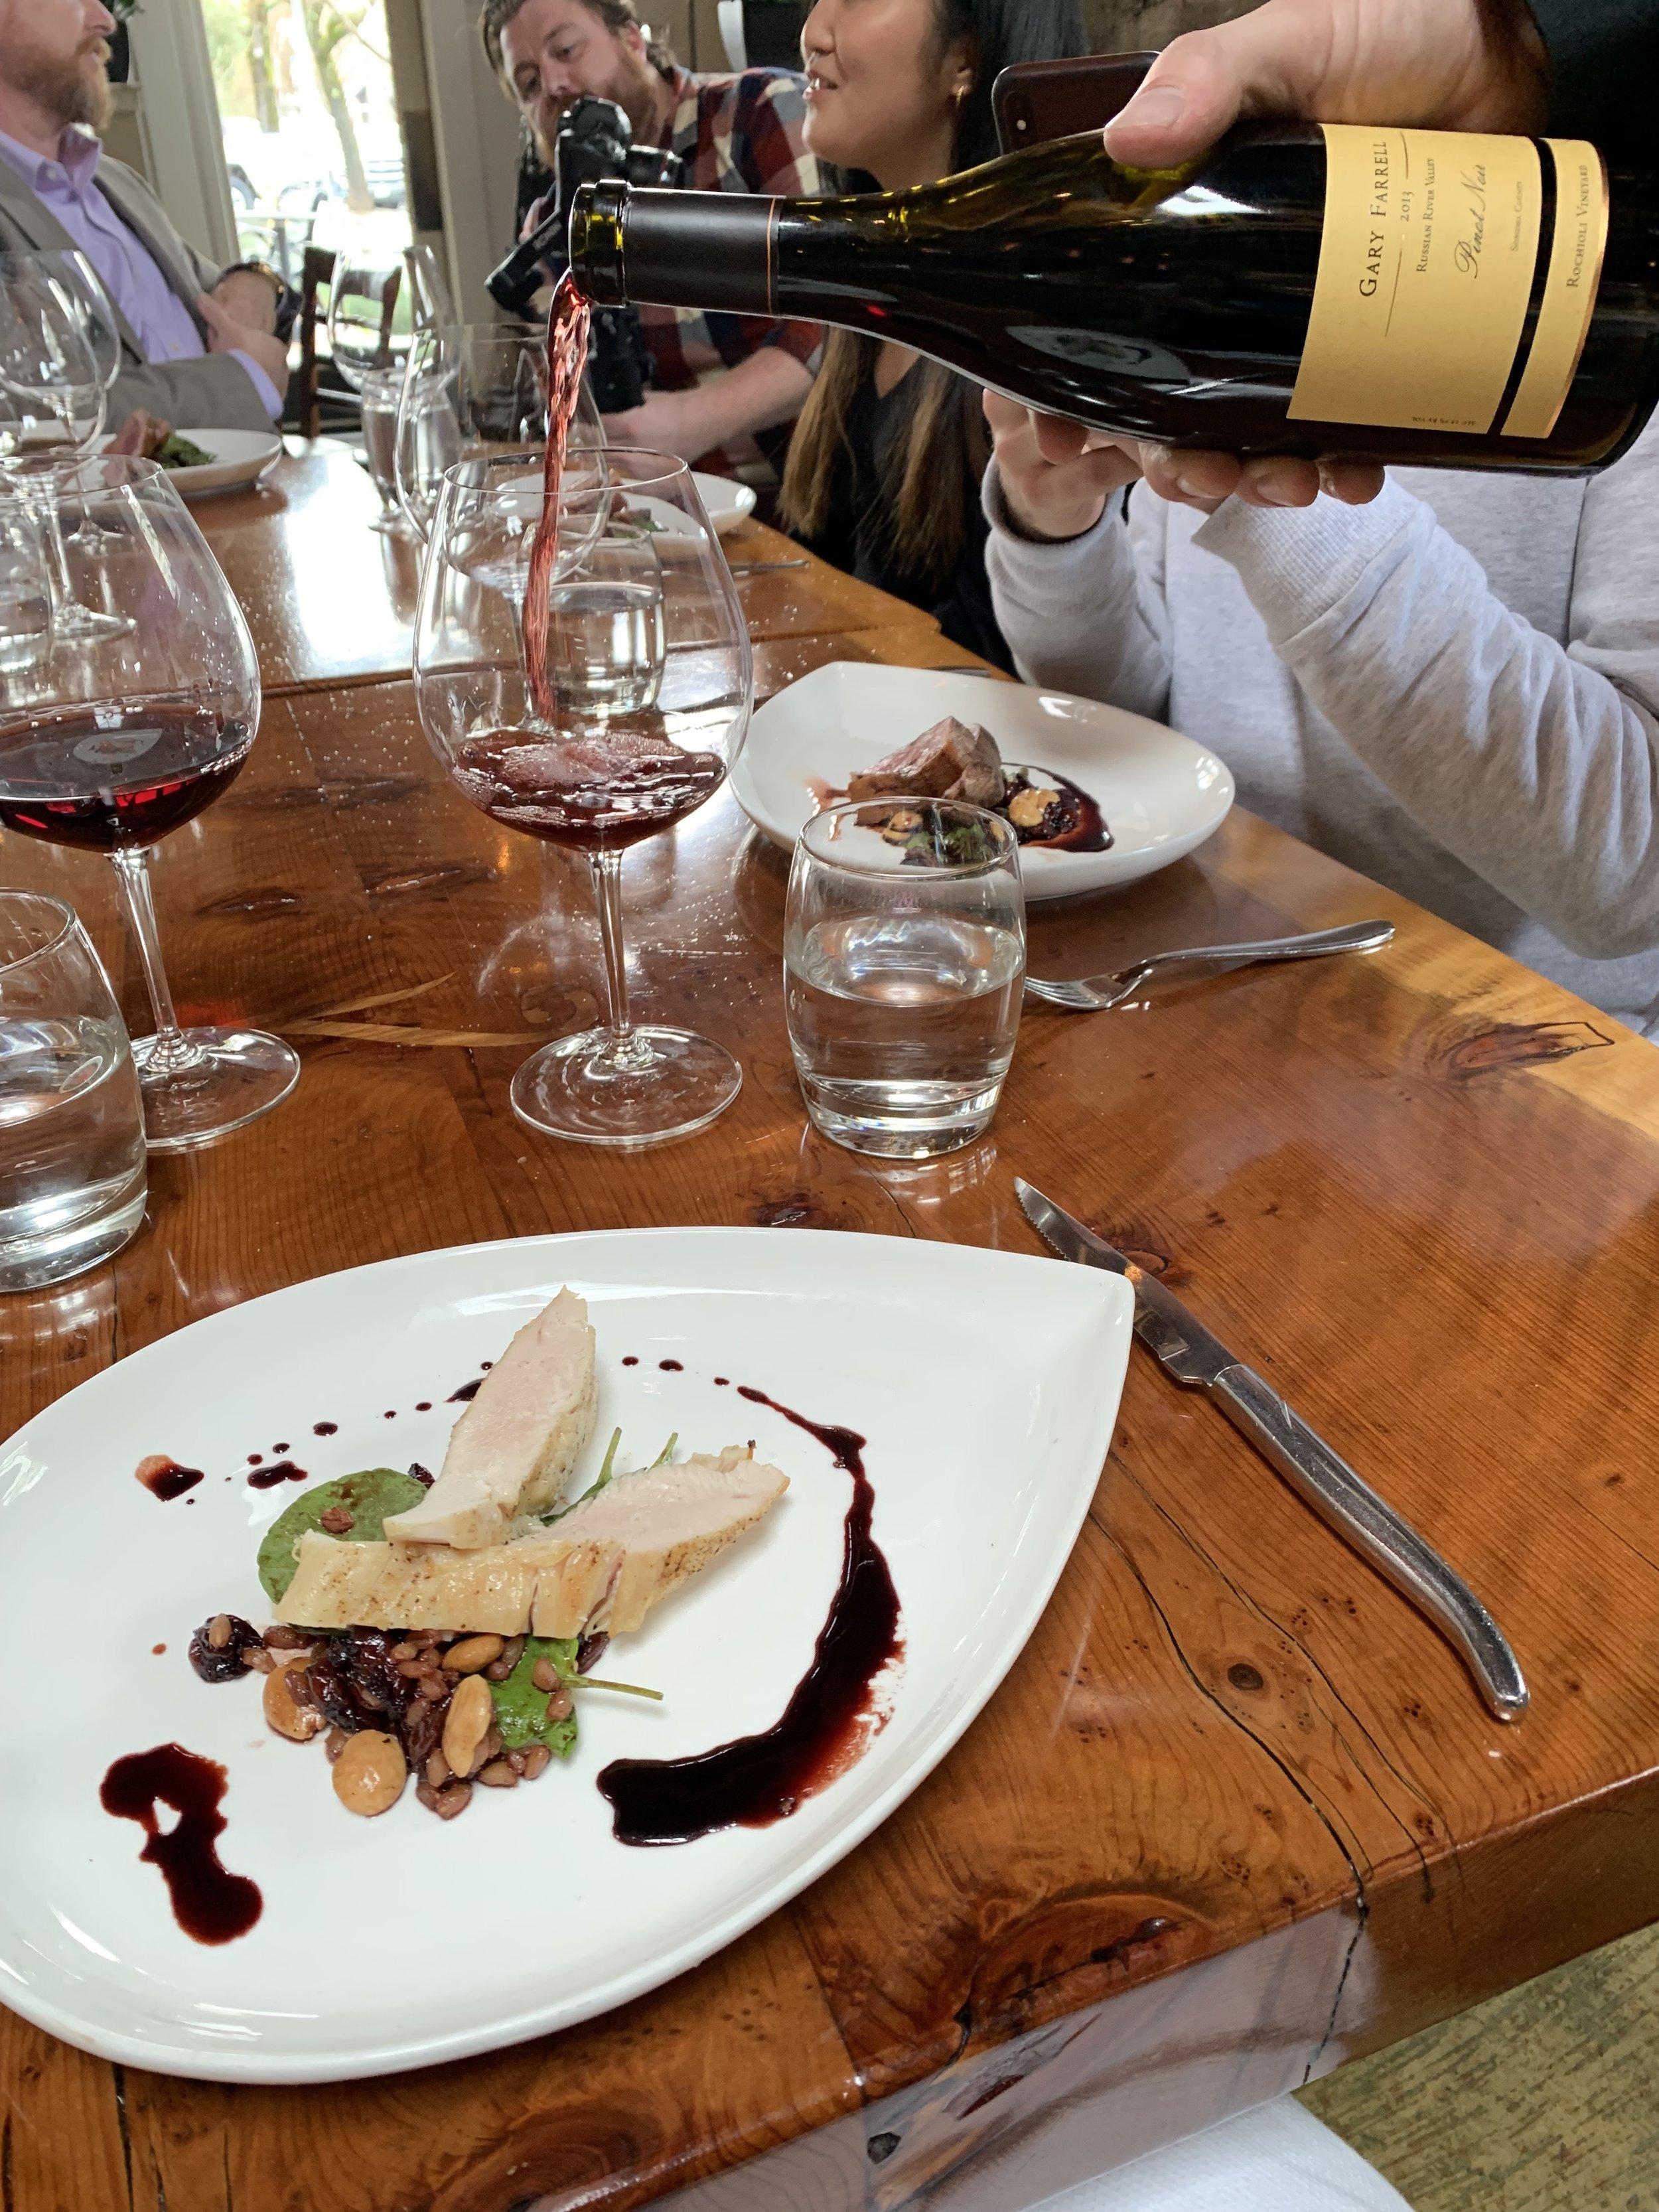 Gary Farrell Winery Bloggers lunch at Valette Restaurant, Healdsburg